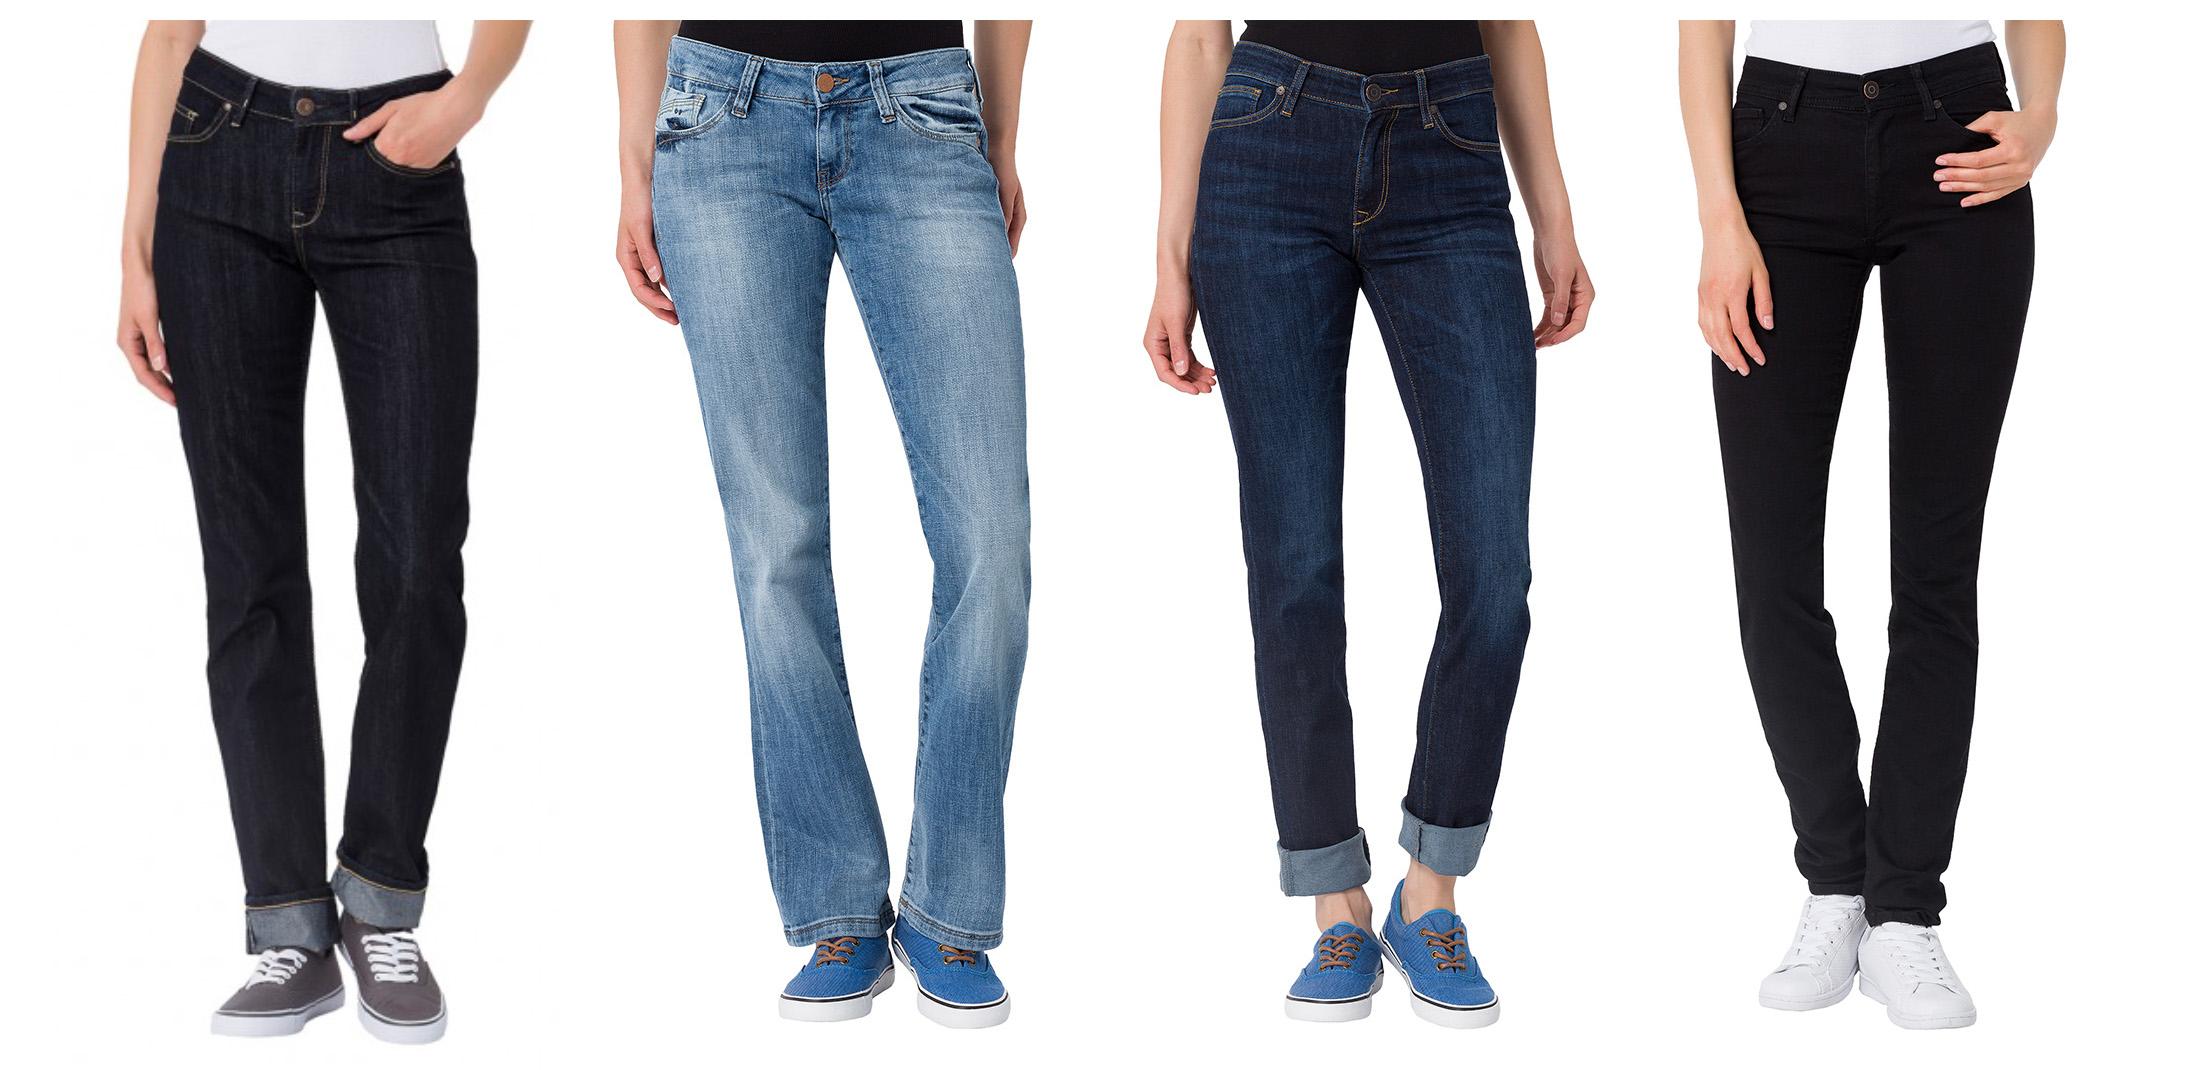 Welcher Jeans Typ bin ich? | Big Deal Jeans